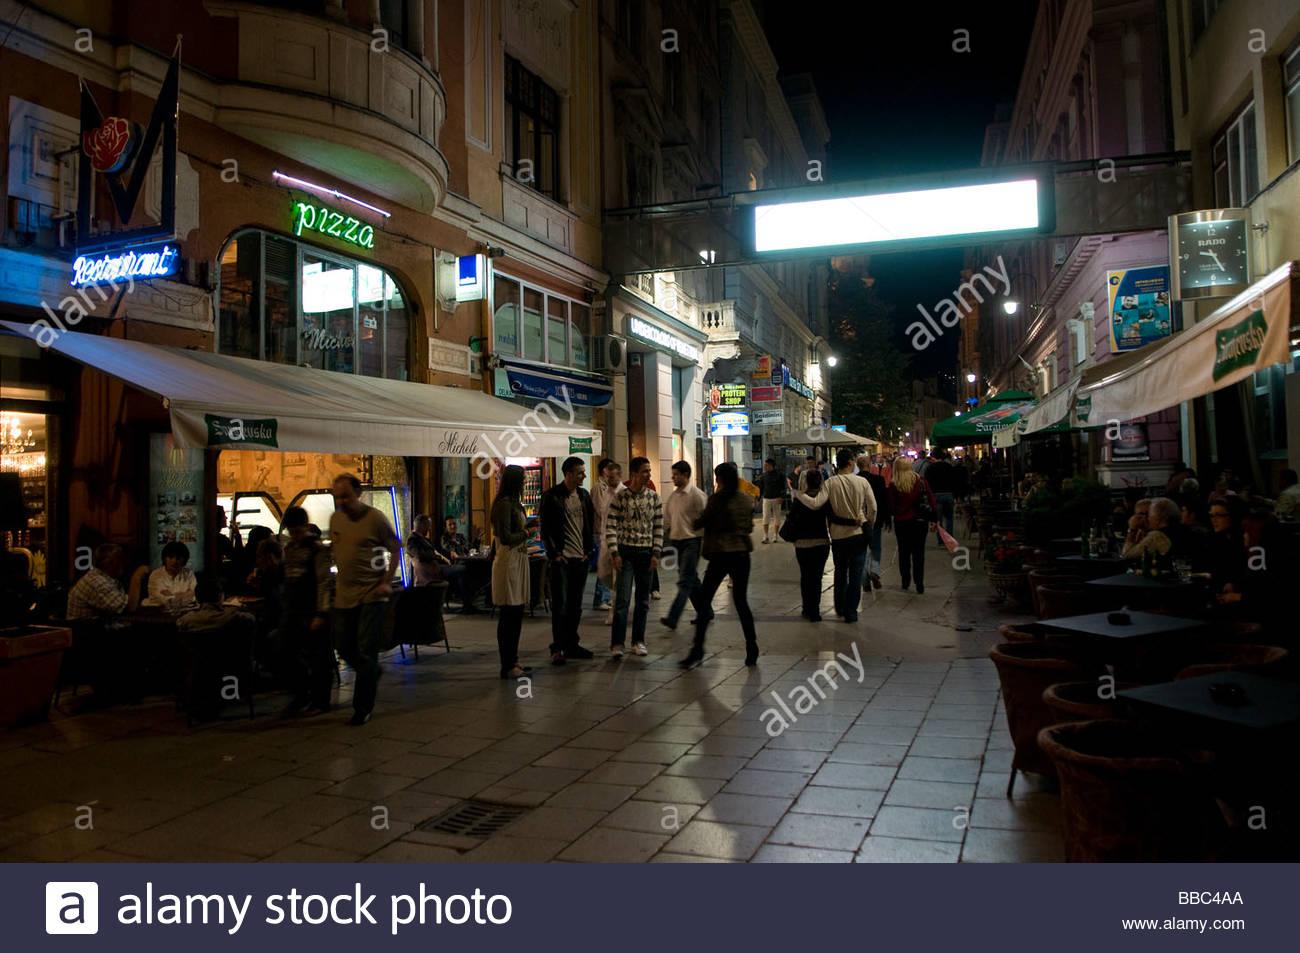 Pedestrians walking along Ferhadija street in the old town of Sarajevo capital of Bosnia Herzegovina - Stock Image